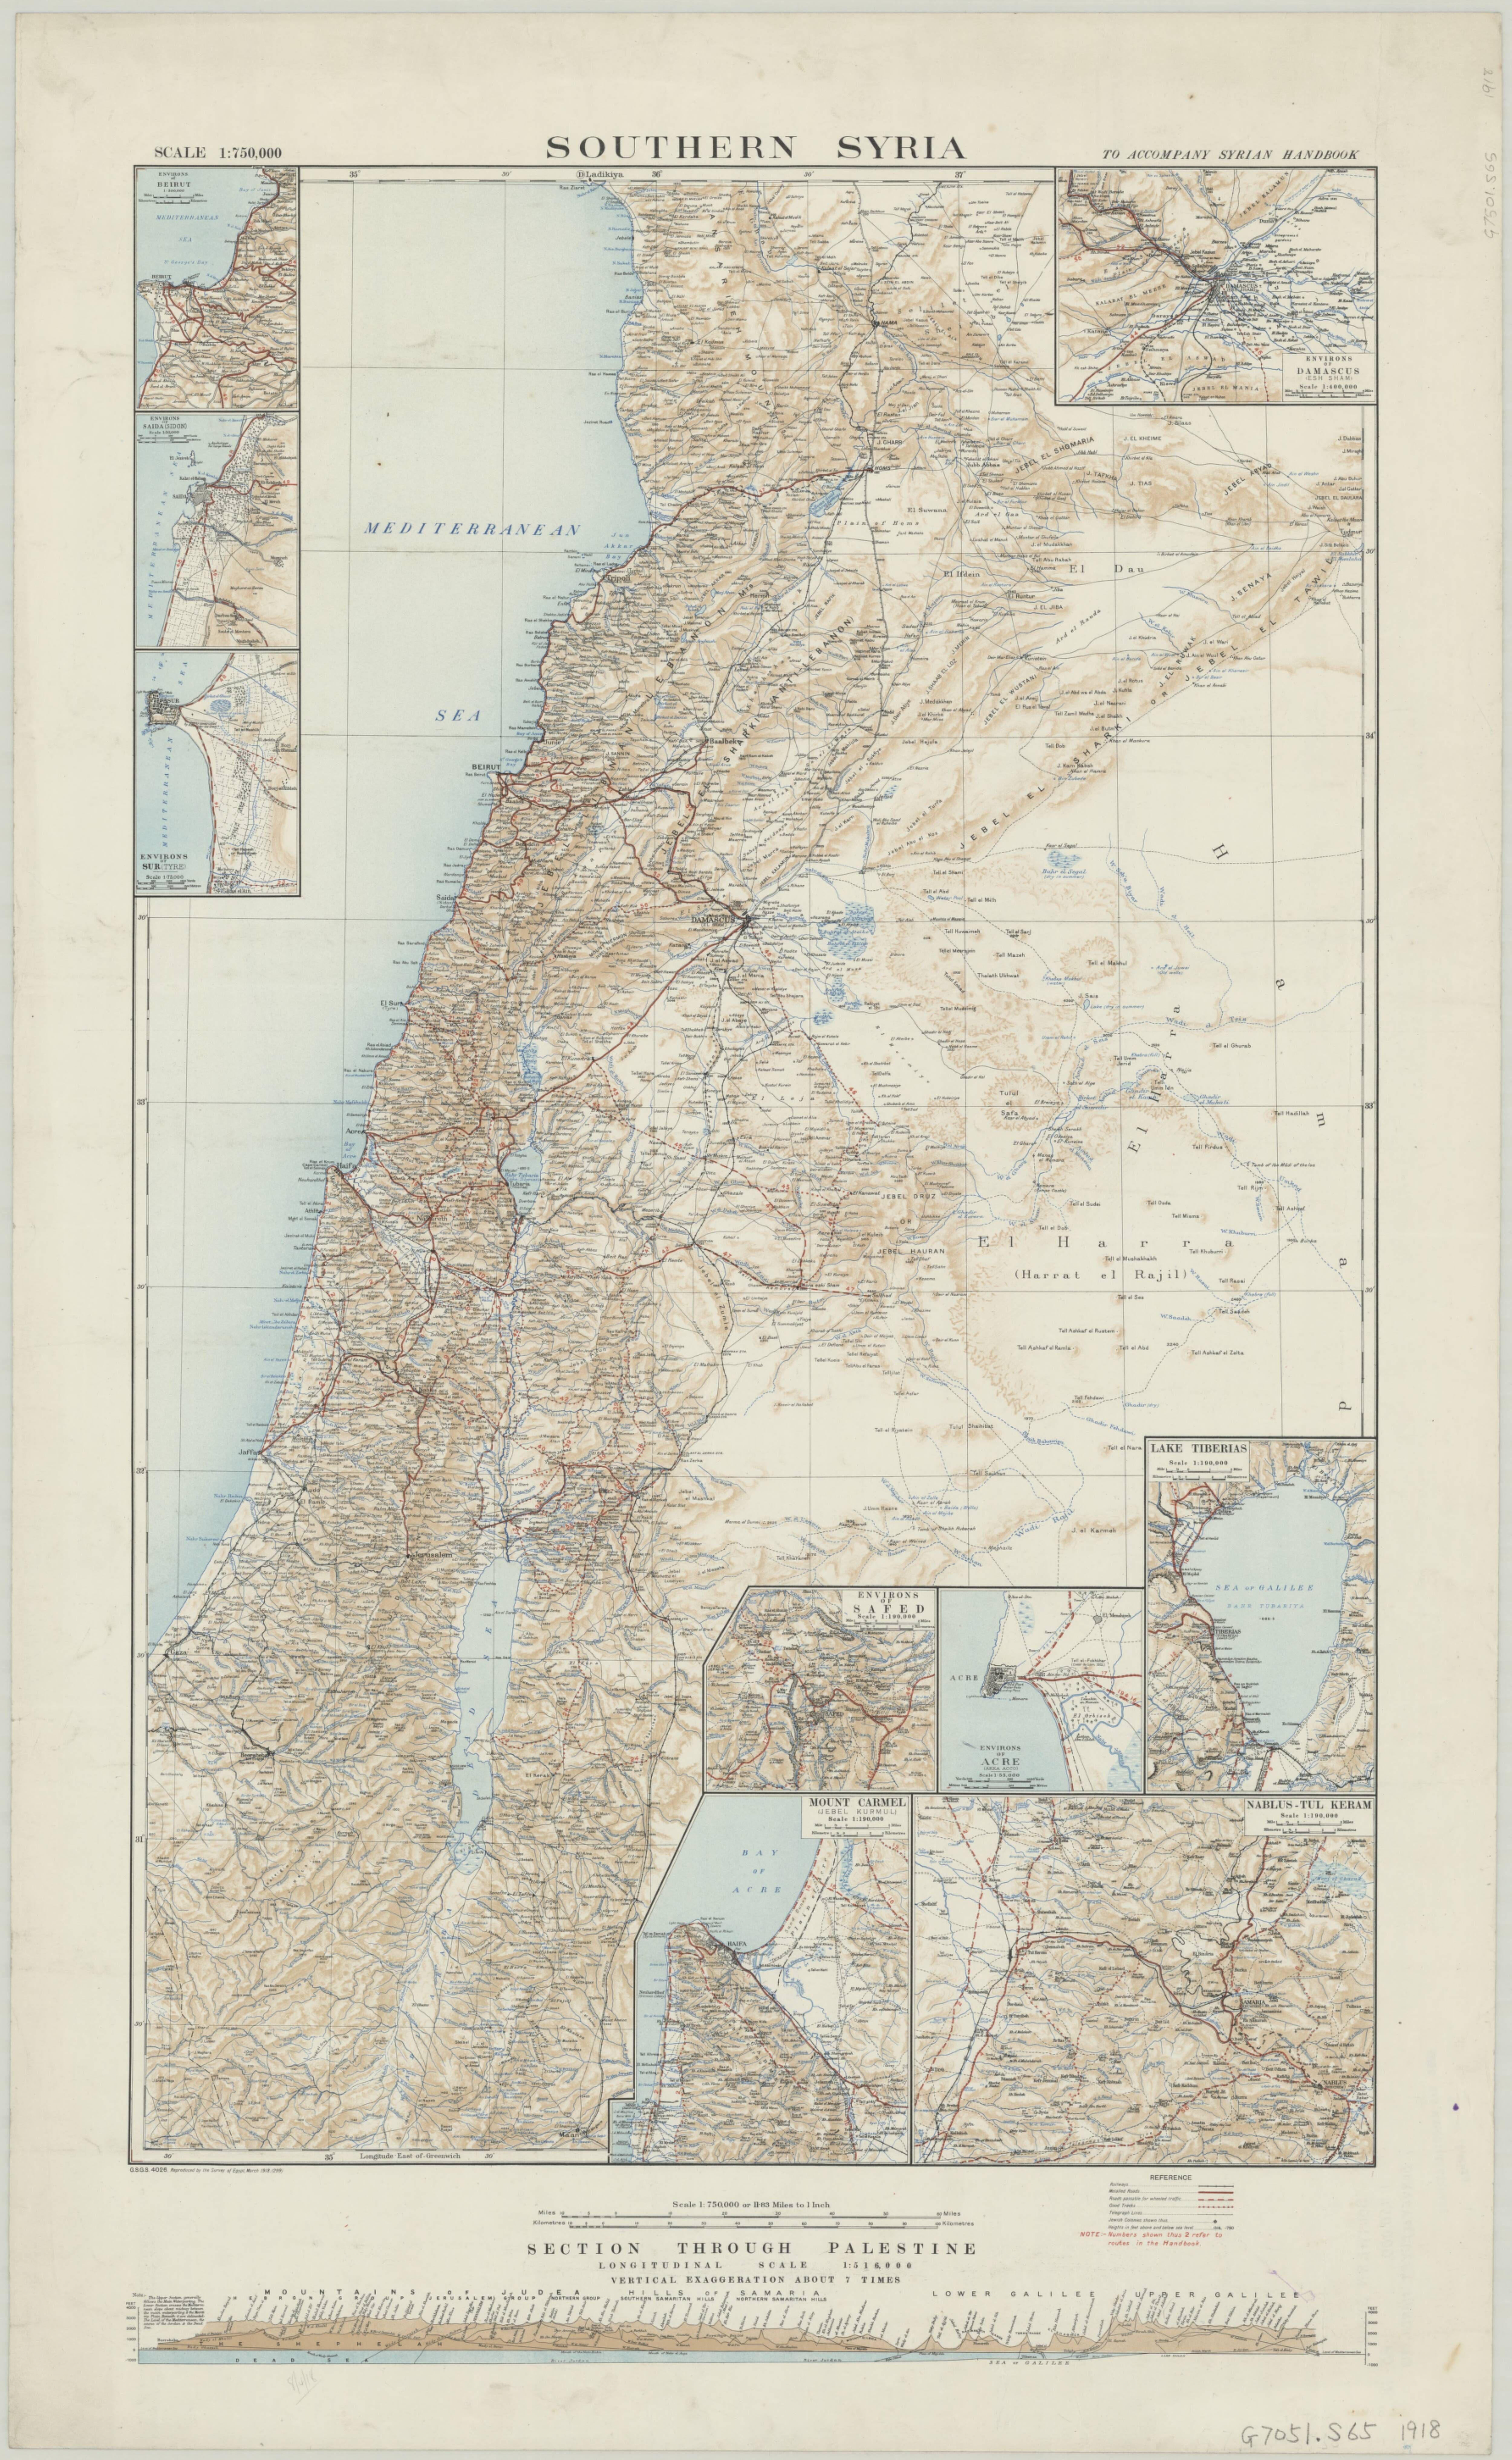 Southern Syria 1918 SyriaSouthernMaps Southern Syria